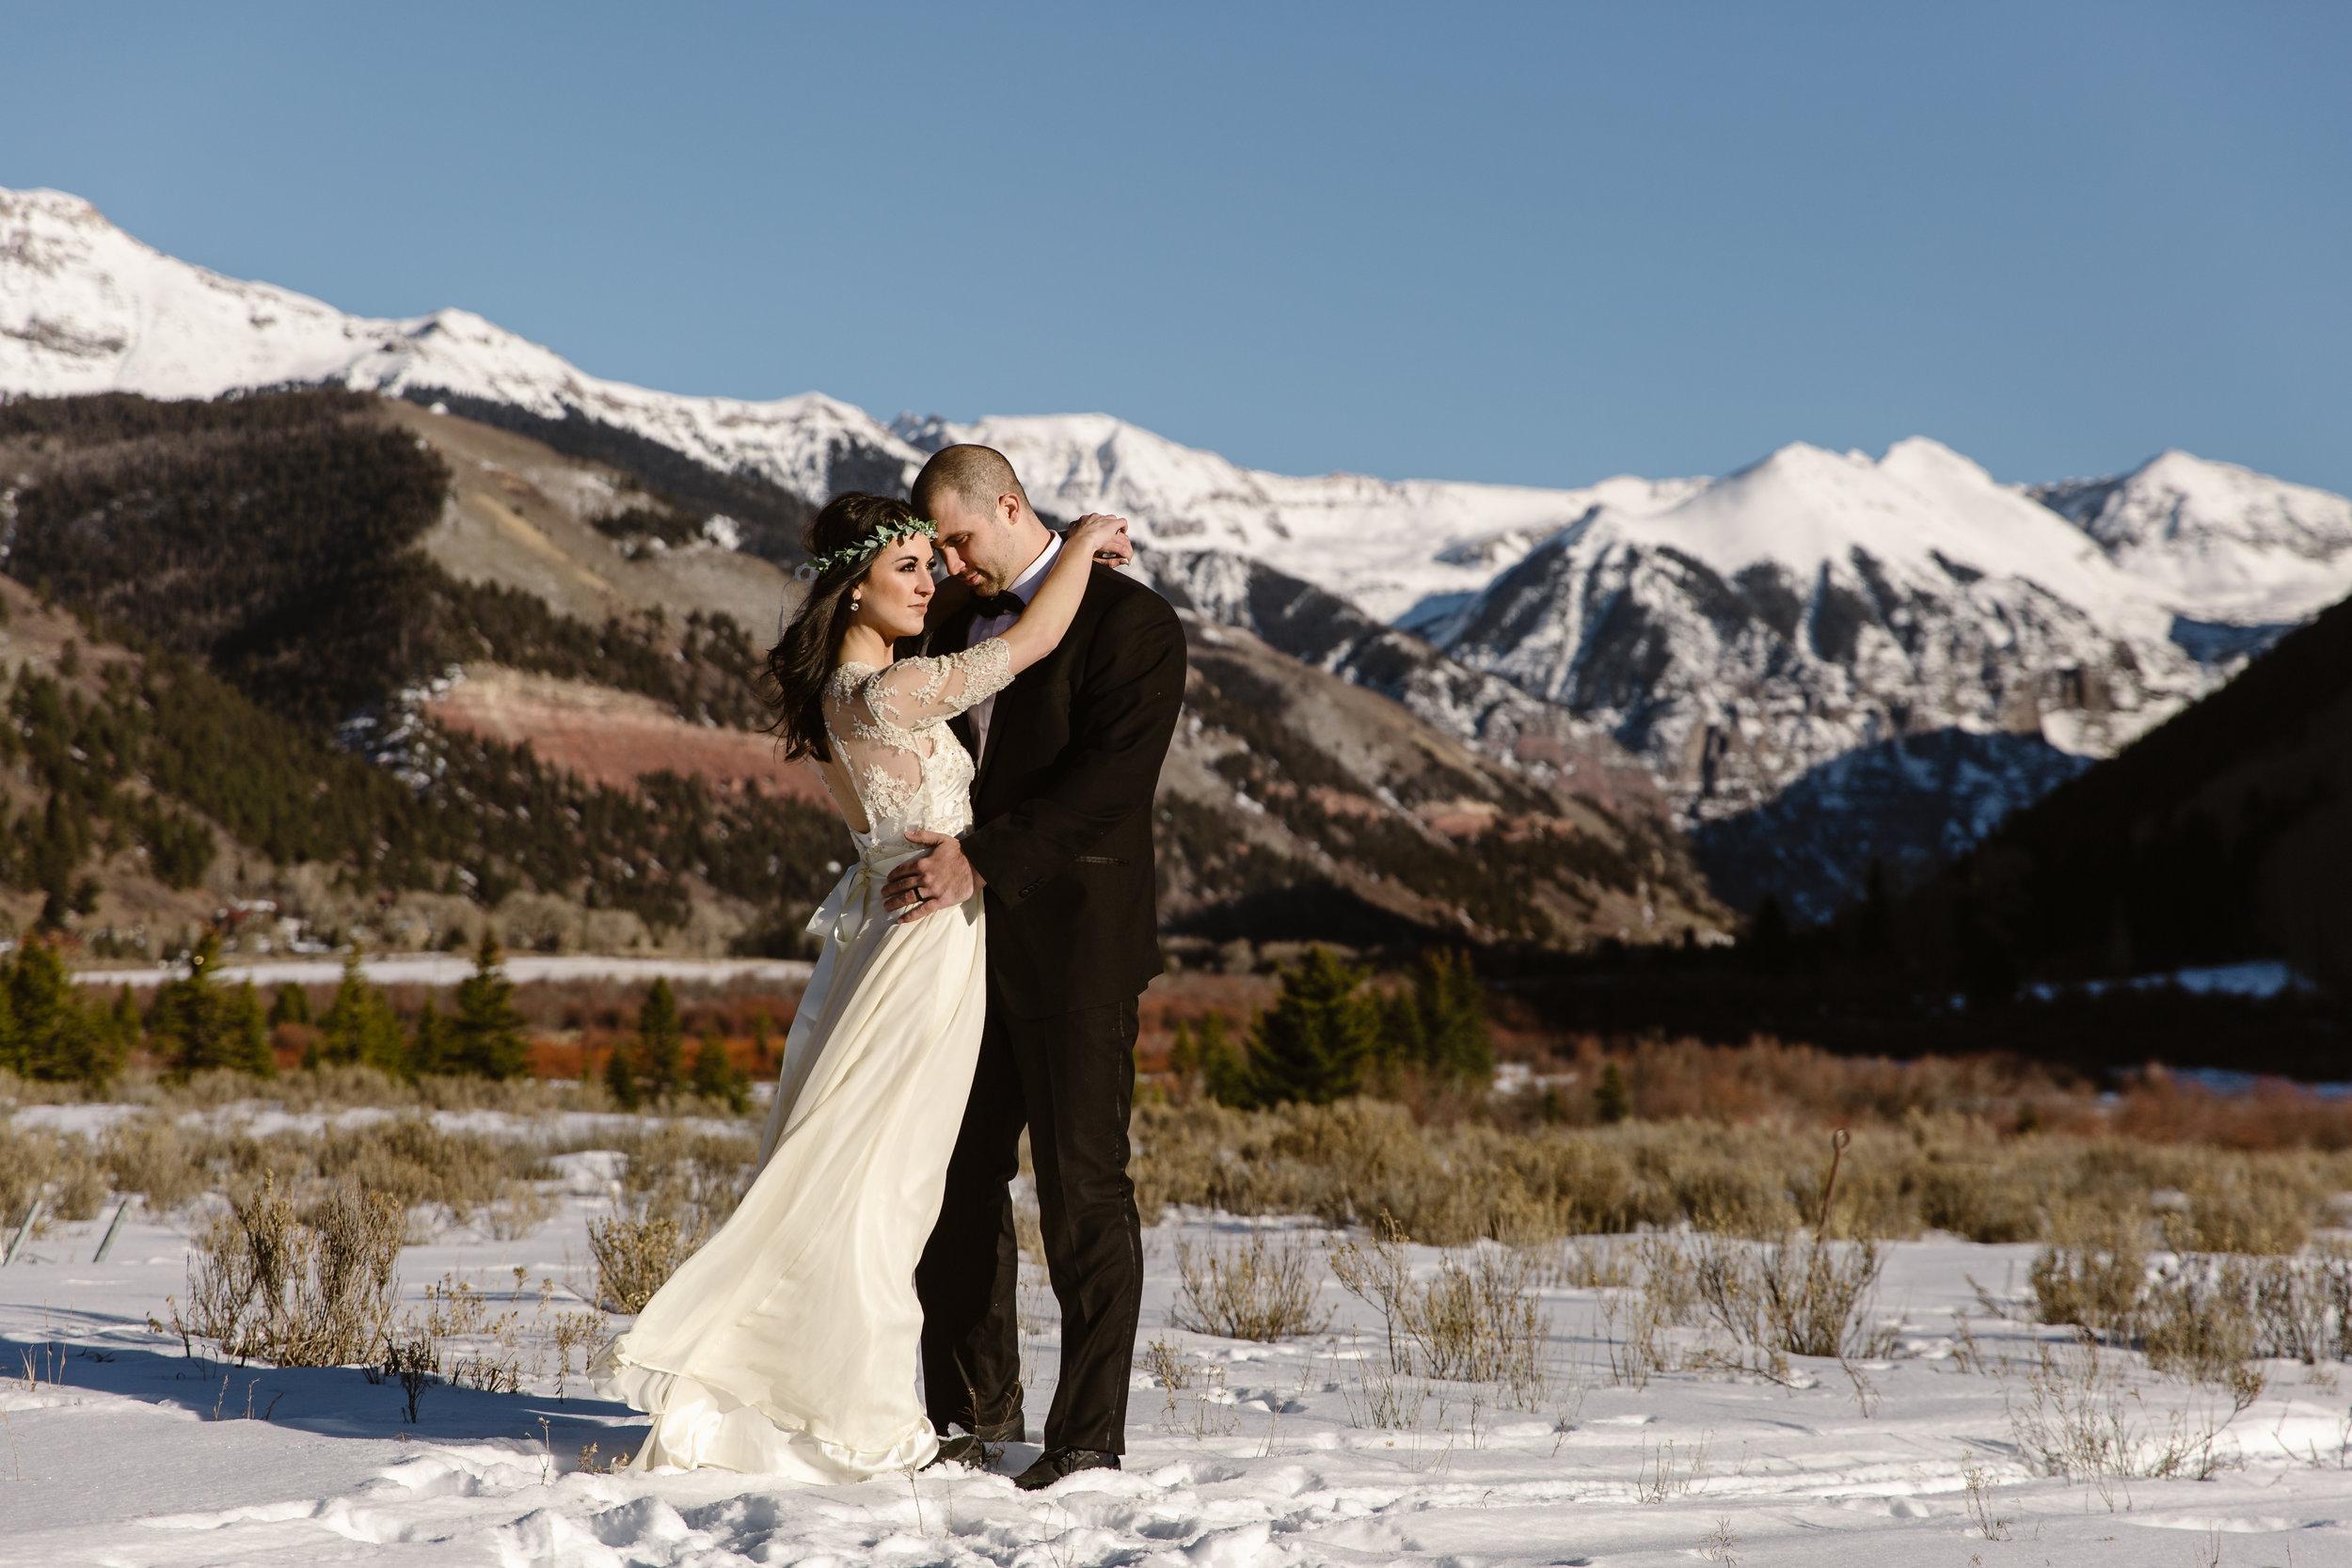 LD-Telluride-Wedding-Mountain-LeahandAshton-Photography-2.jpeg